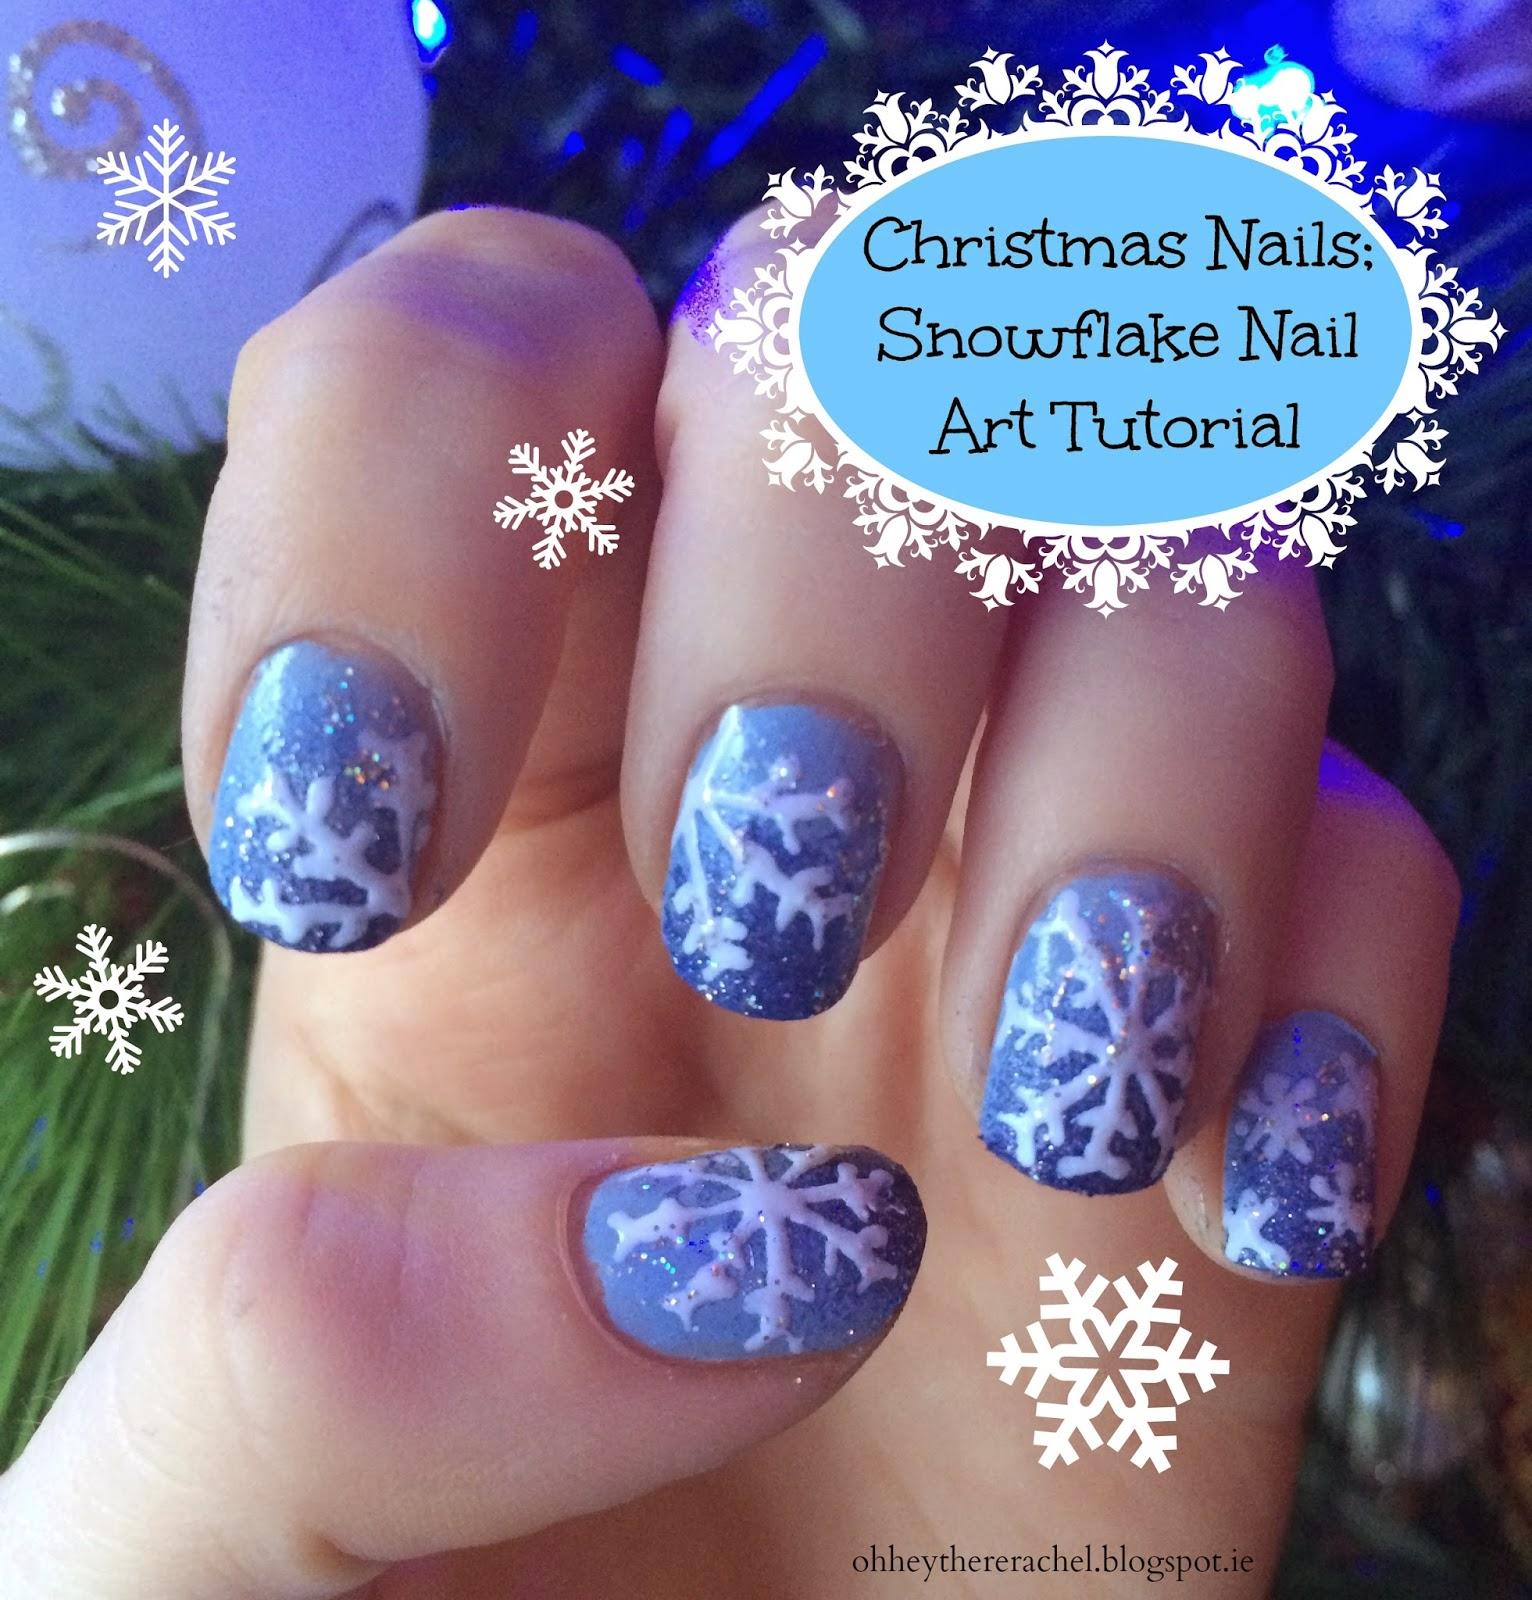 Christmas Nails Snowflake Nail Art Tutorial Oh Hey There Rachel